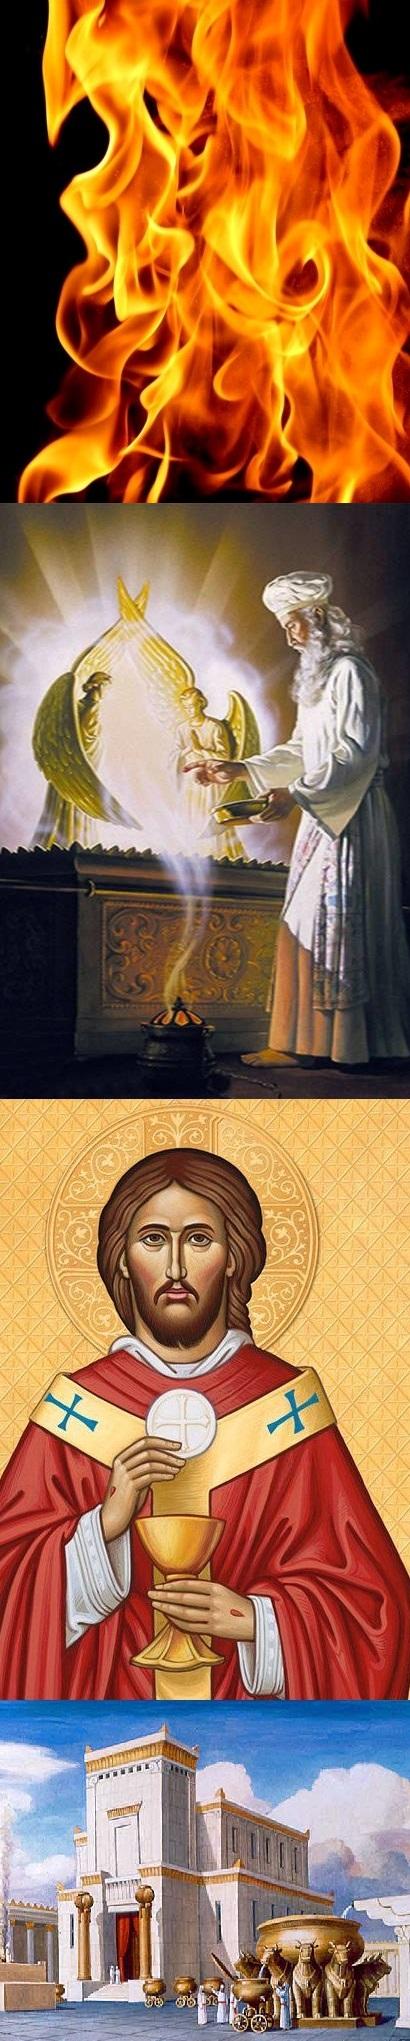 "Sermon from Sunday June 2nd 2013 / Pentecost ""Prayer and the Presence of God"" - Image 8"